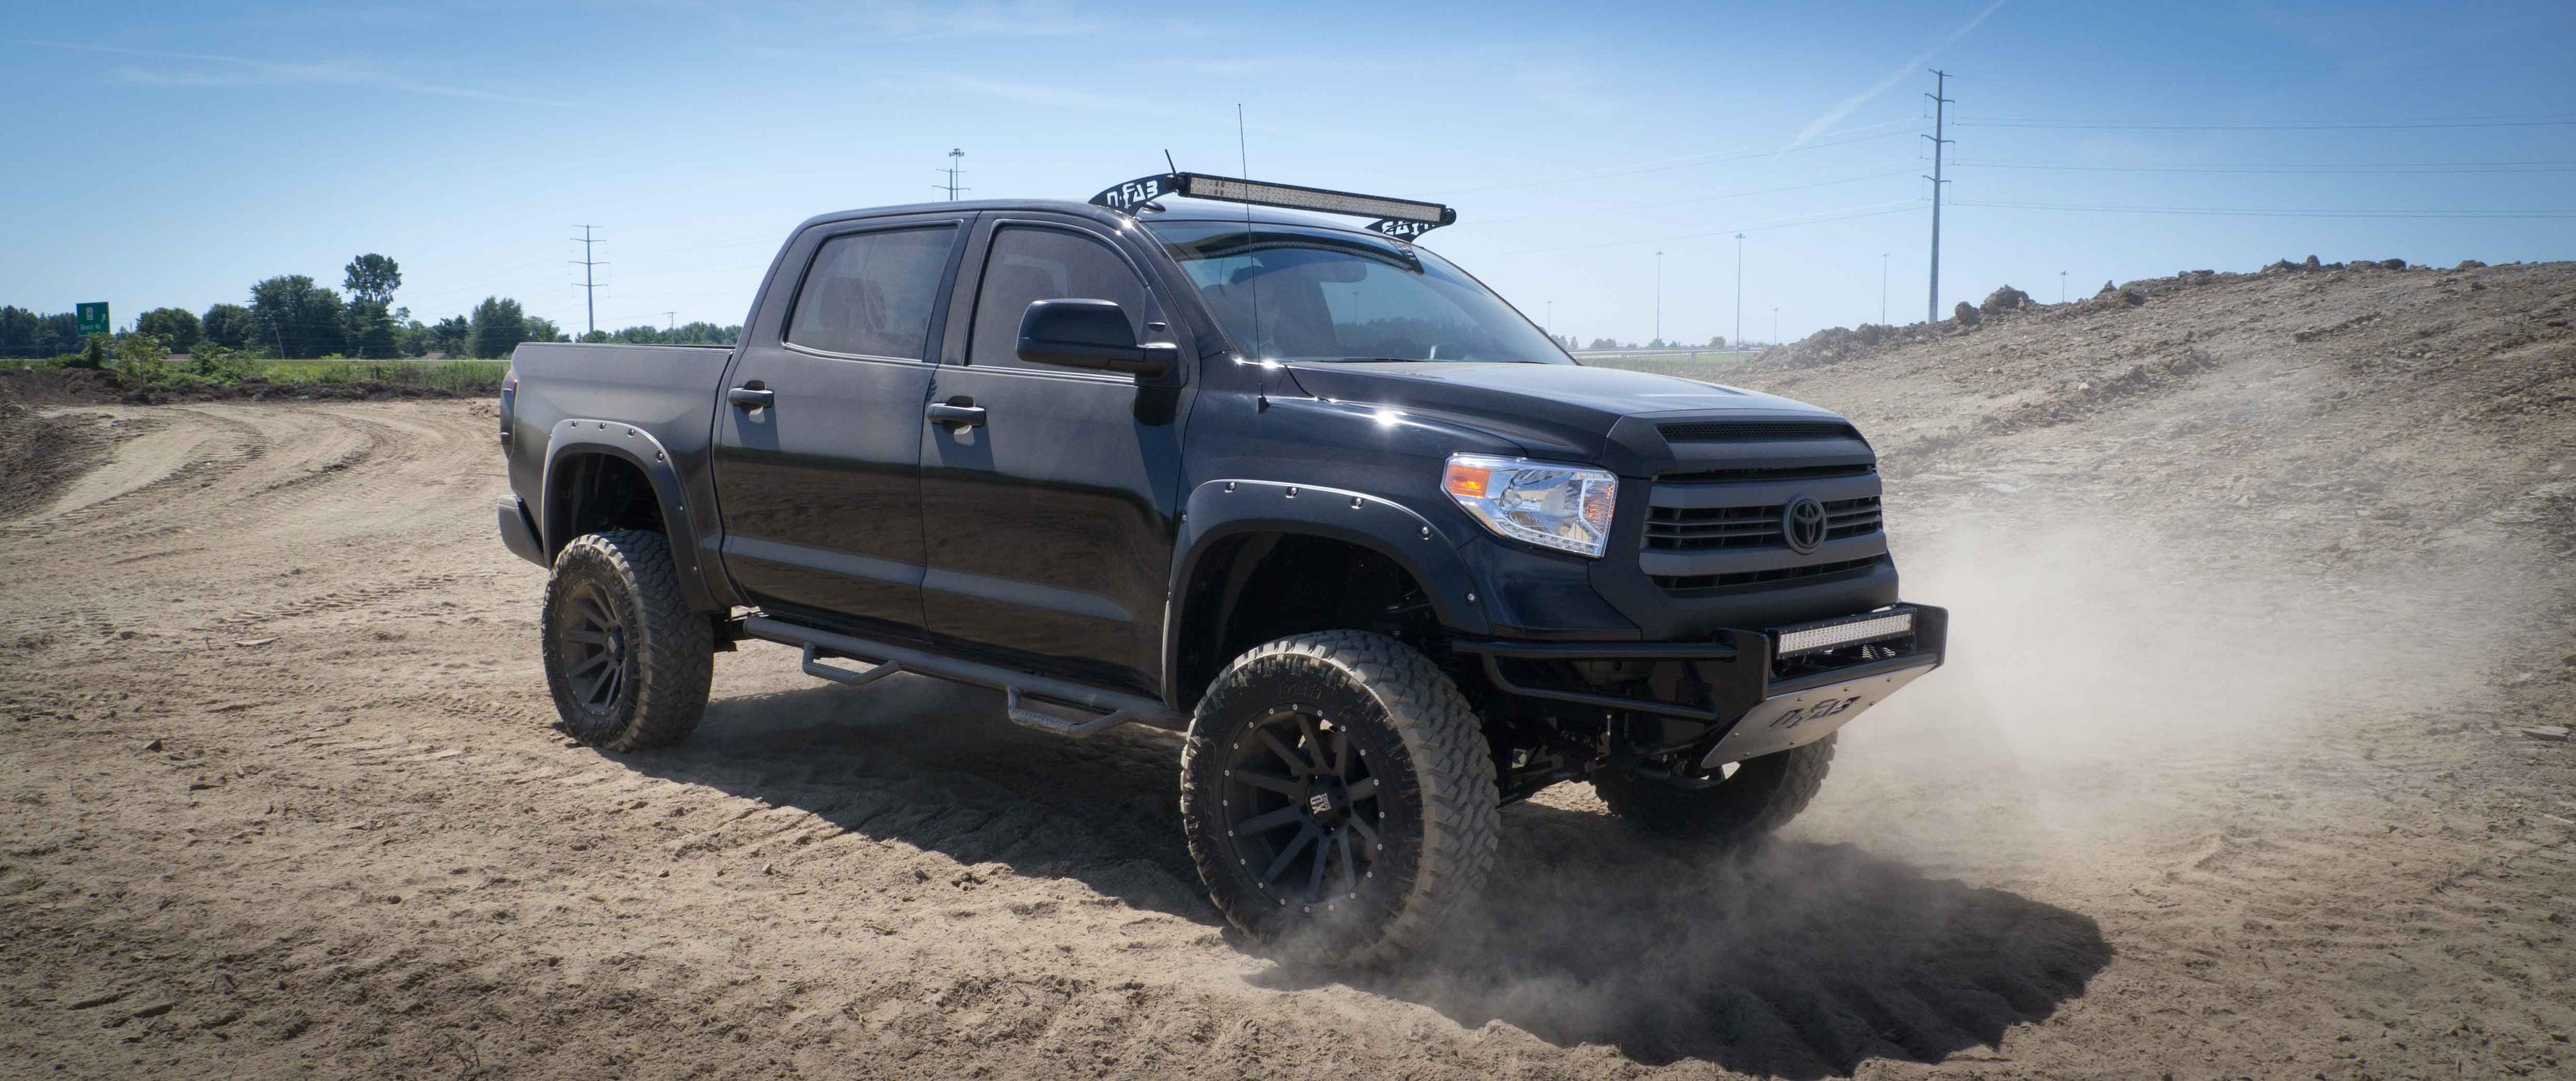 Germain Toyota Lifted Big Trucks Amp Lift Kits Toyota